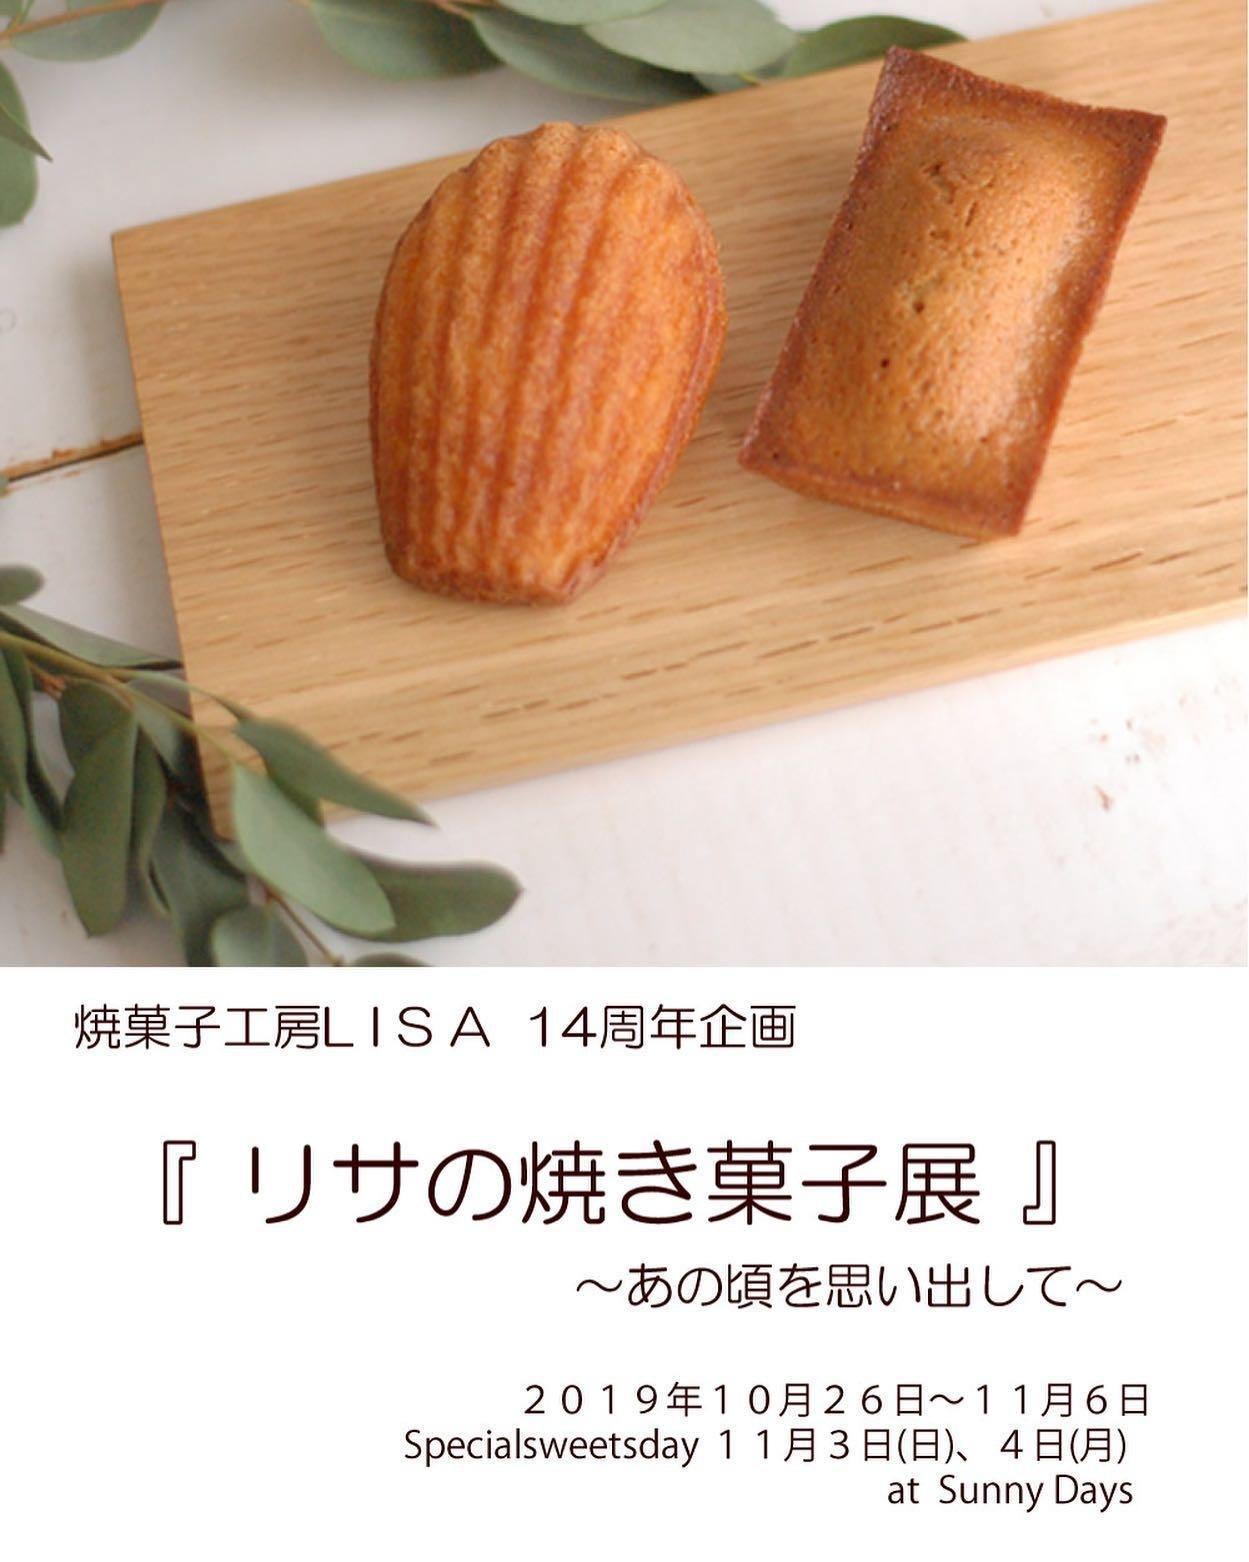 MayMe出版記念イベント&リサの焼き菓子展_f0130593_11091993.jpeg